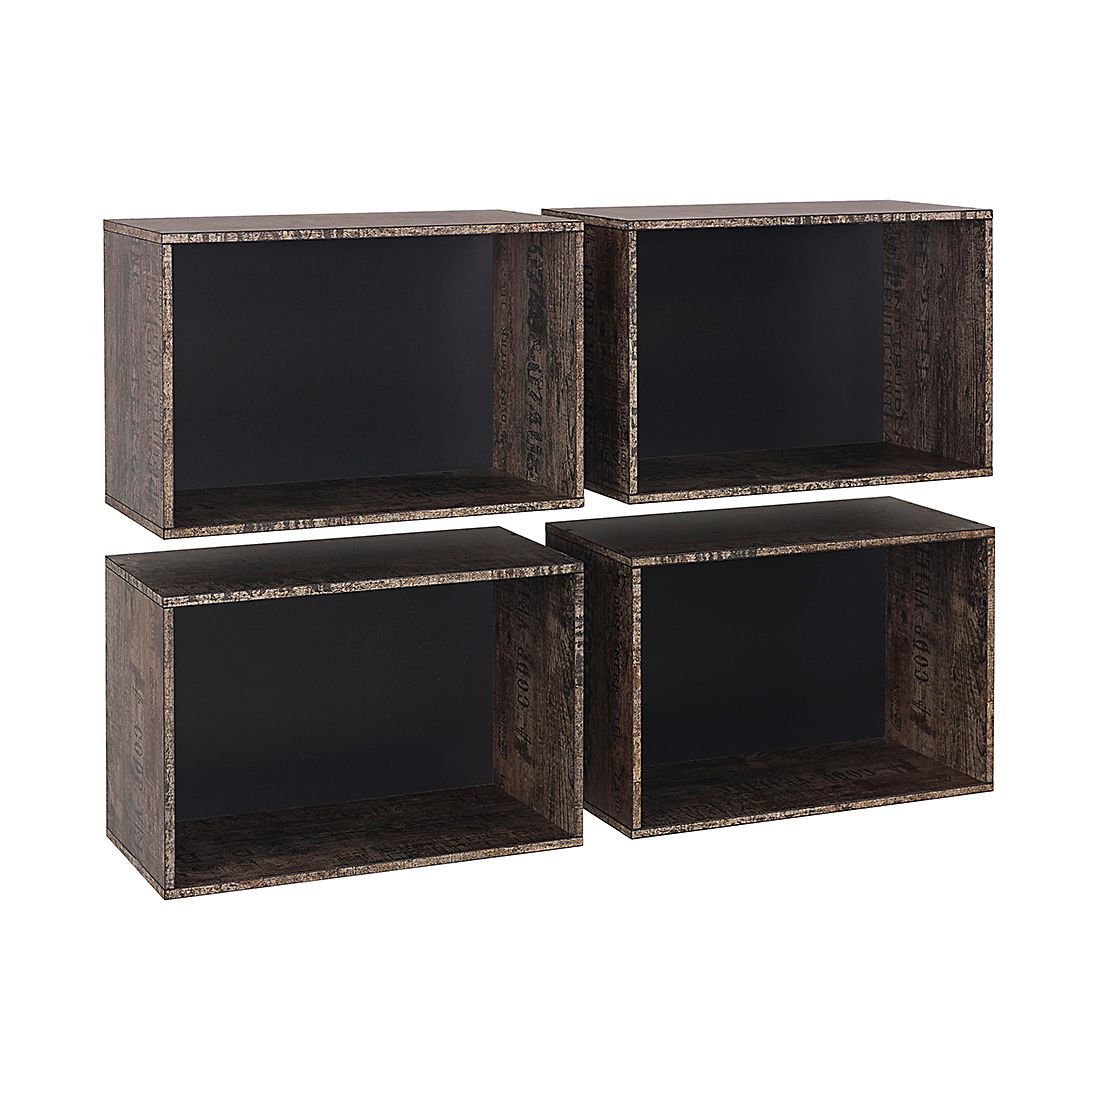 Kisten Sumatra (4-delige set) - vintage bruin/zwart, Rauch Select